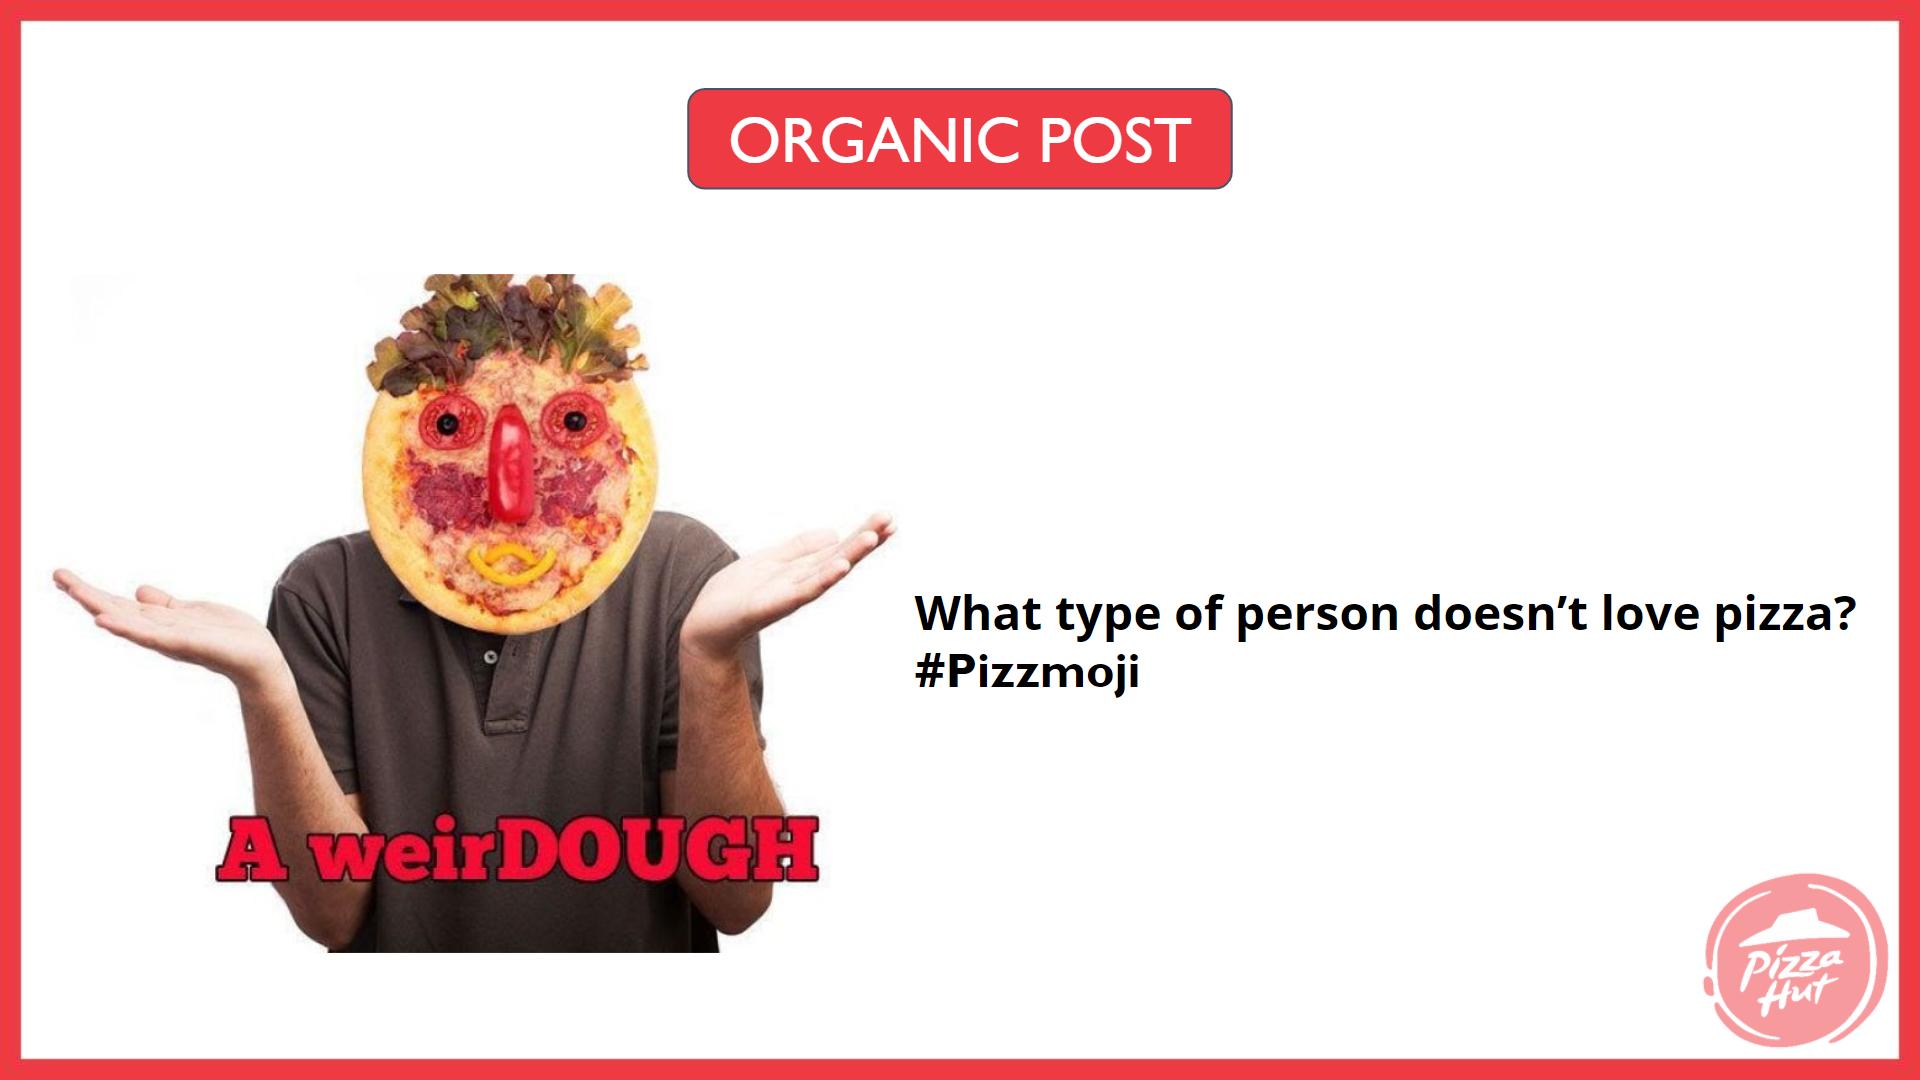 pizza hut marketing strategy Organic Posts - Pizza Hut Marketing and Advertising Strategy